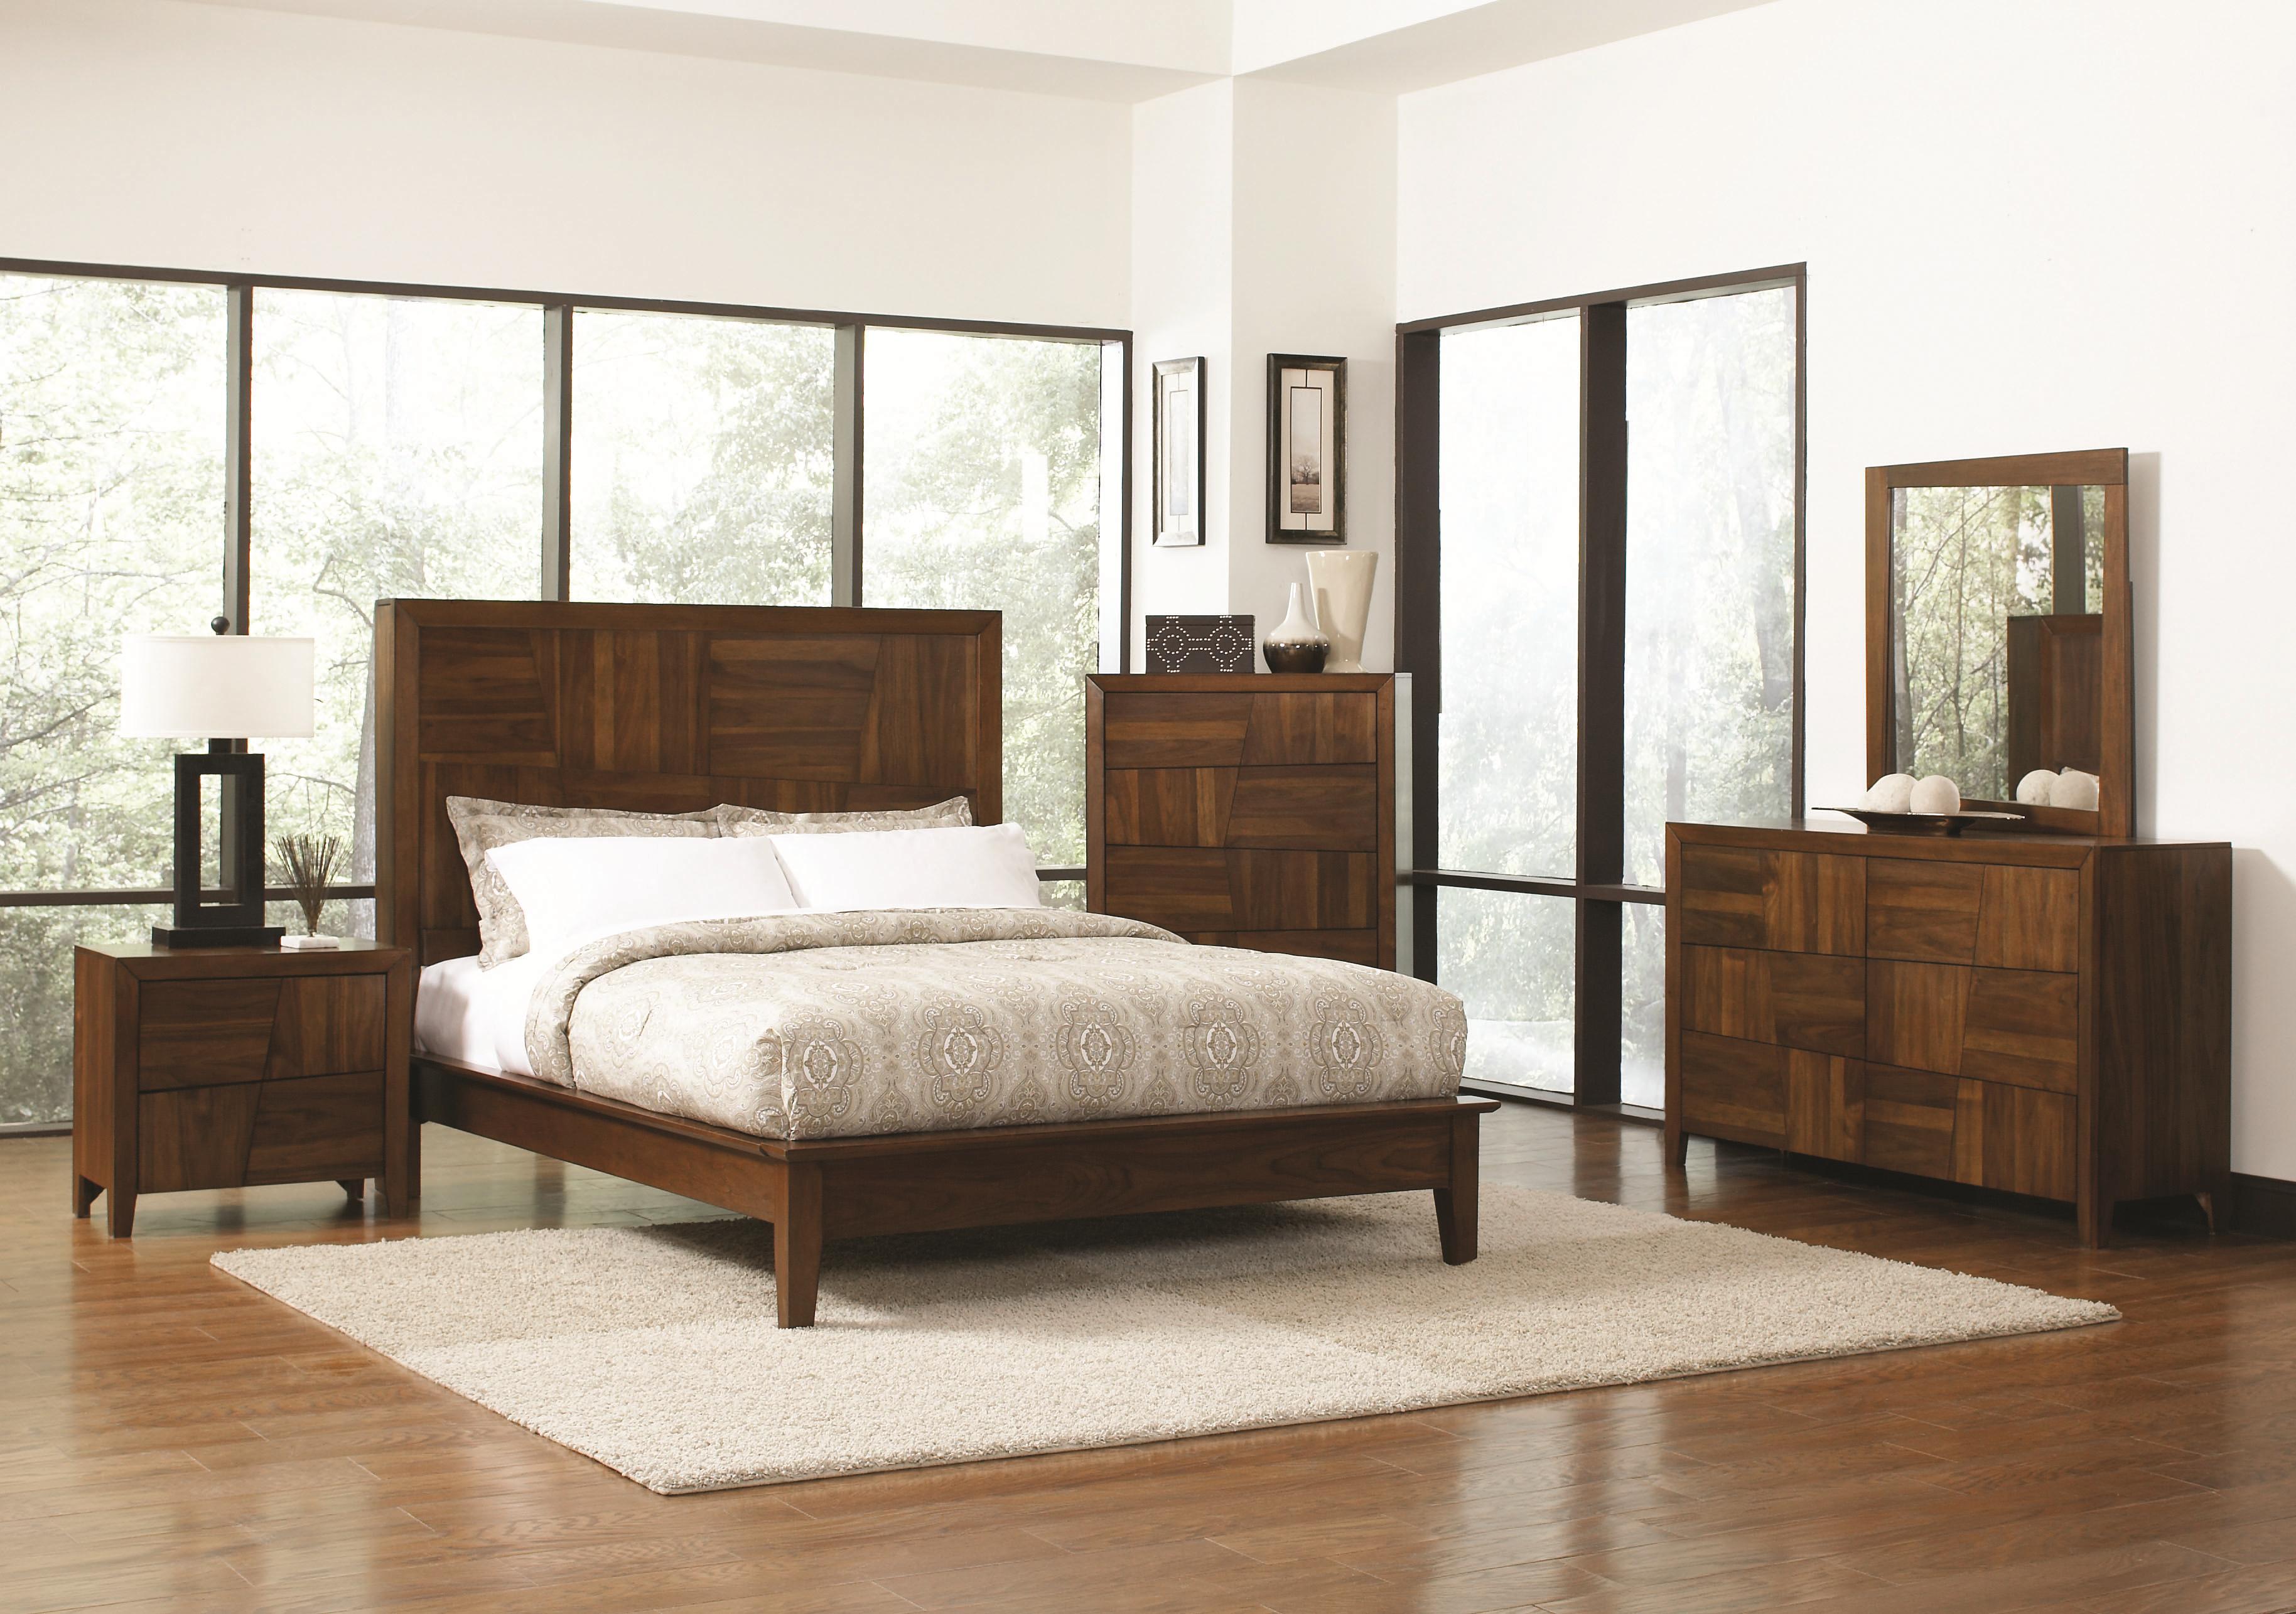 Bedroom Sets That Include Mattresses bdcoa202841 6pc queen bedroom set reg$2399.90 now $1599.90 - pina